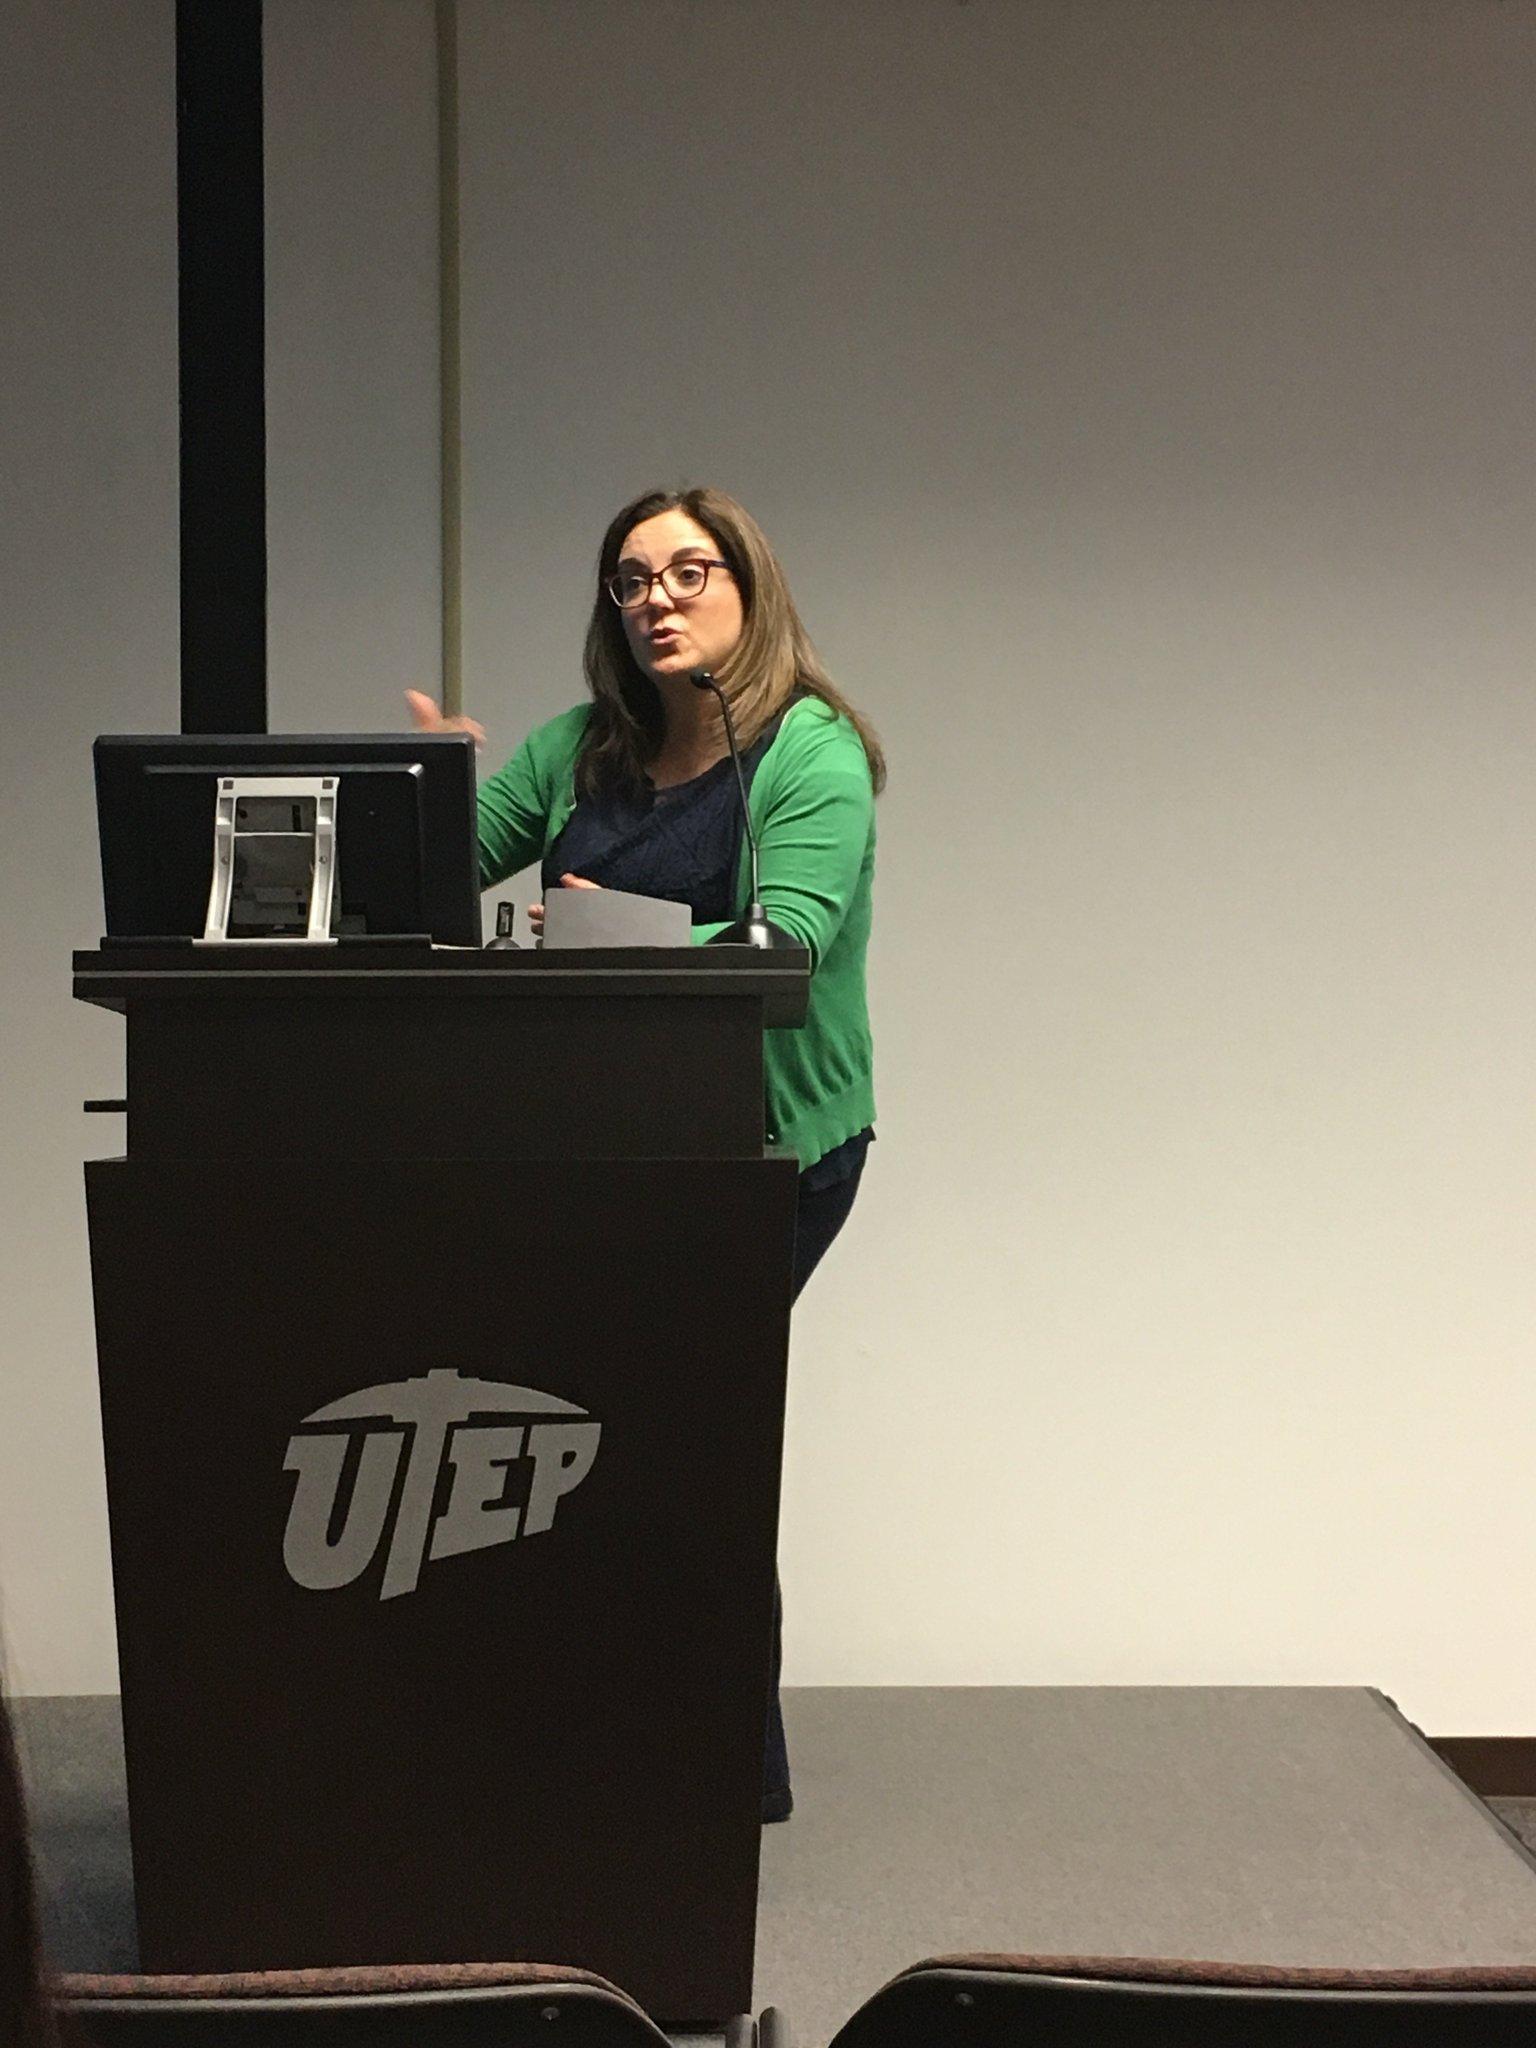 Dr @luciadura introducing the #UTEPRWS Graduate Panel at the 2017 Spring Symposium. https://t.co/XpMrz3b6dP